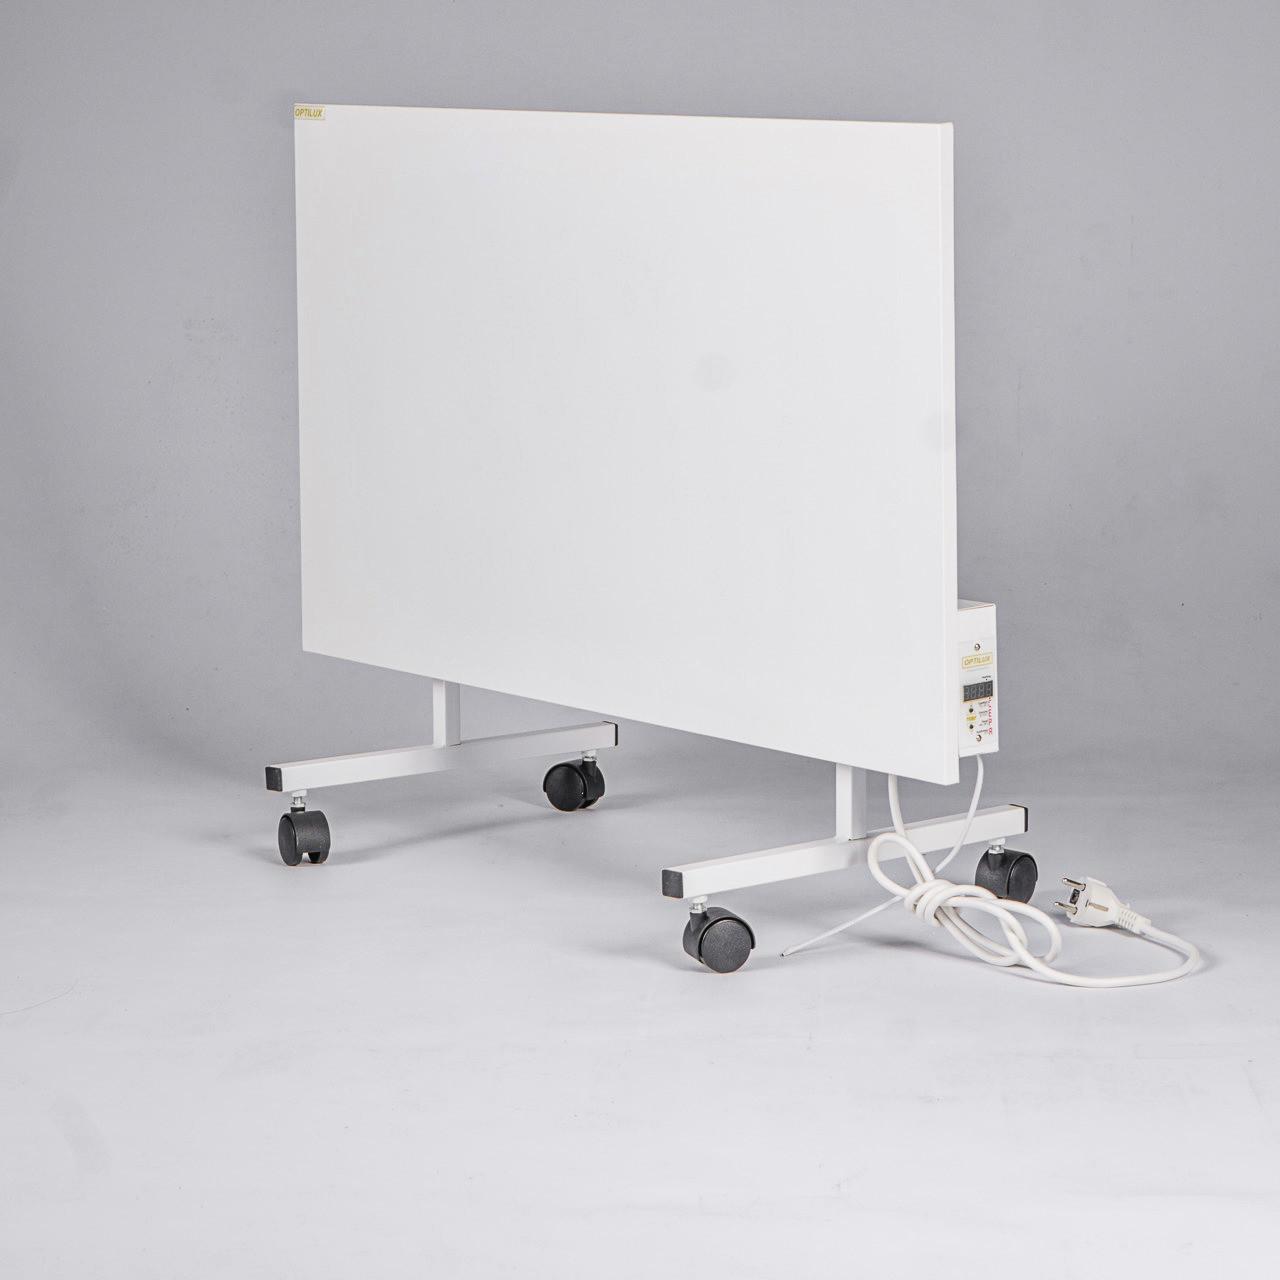 Optilux P500НВП до 12 м² Энергосберегающий металлический обогреватель с электронным терморегулятором (80х47см)